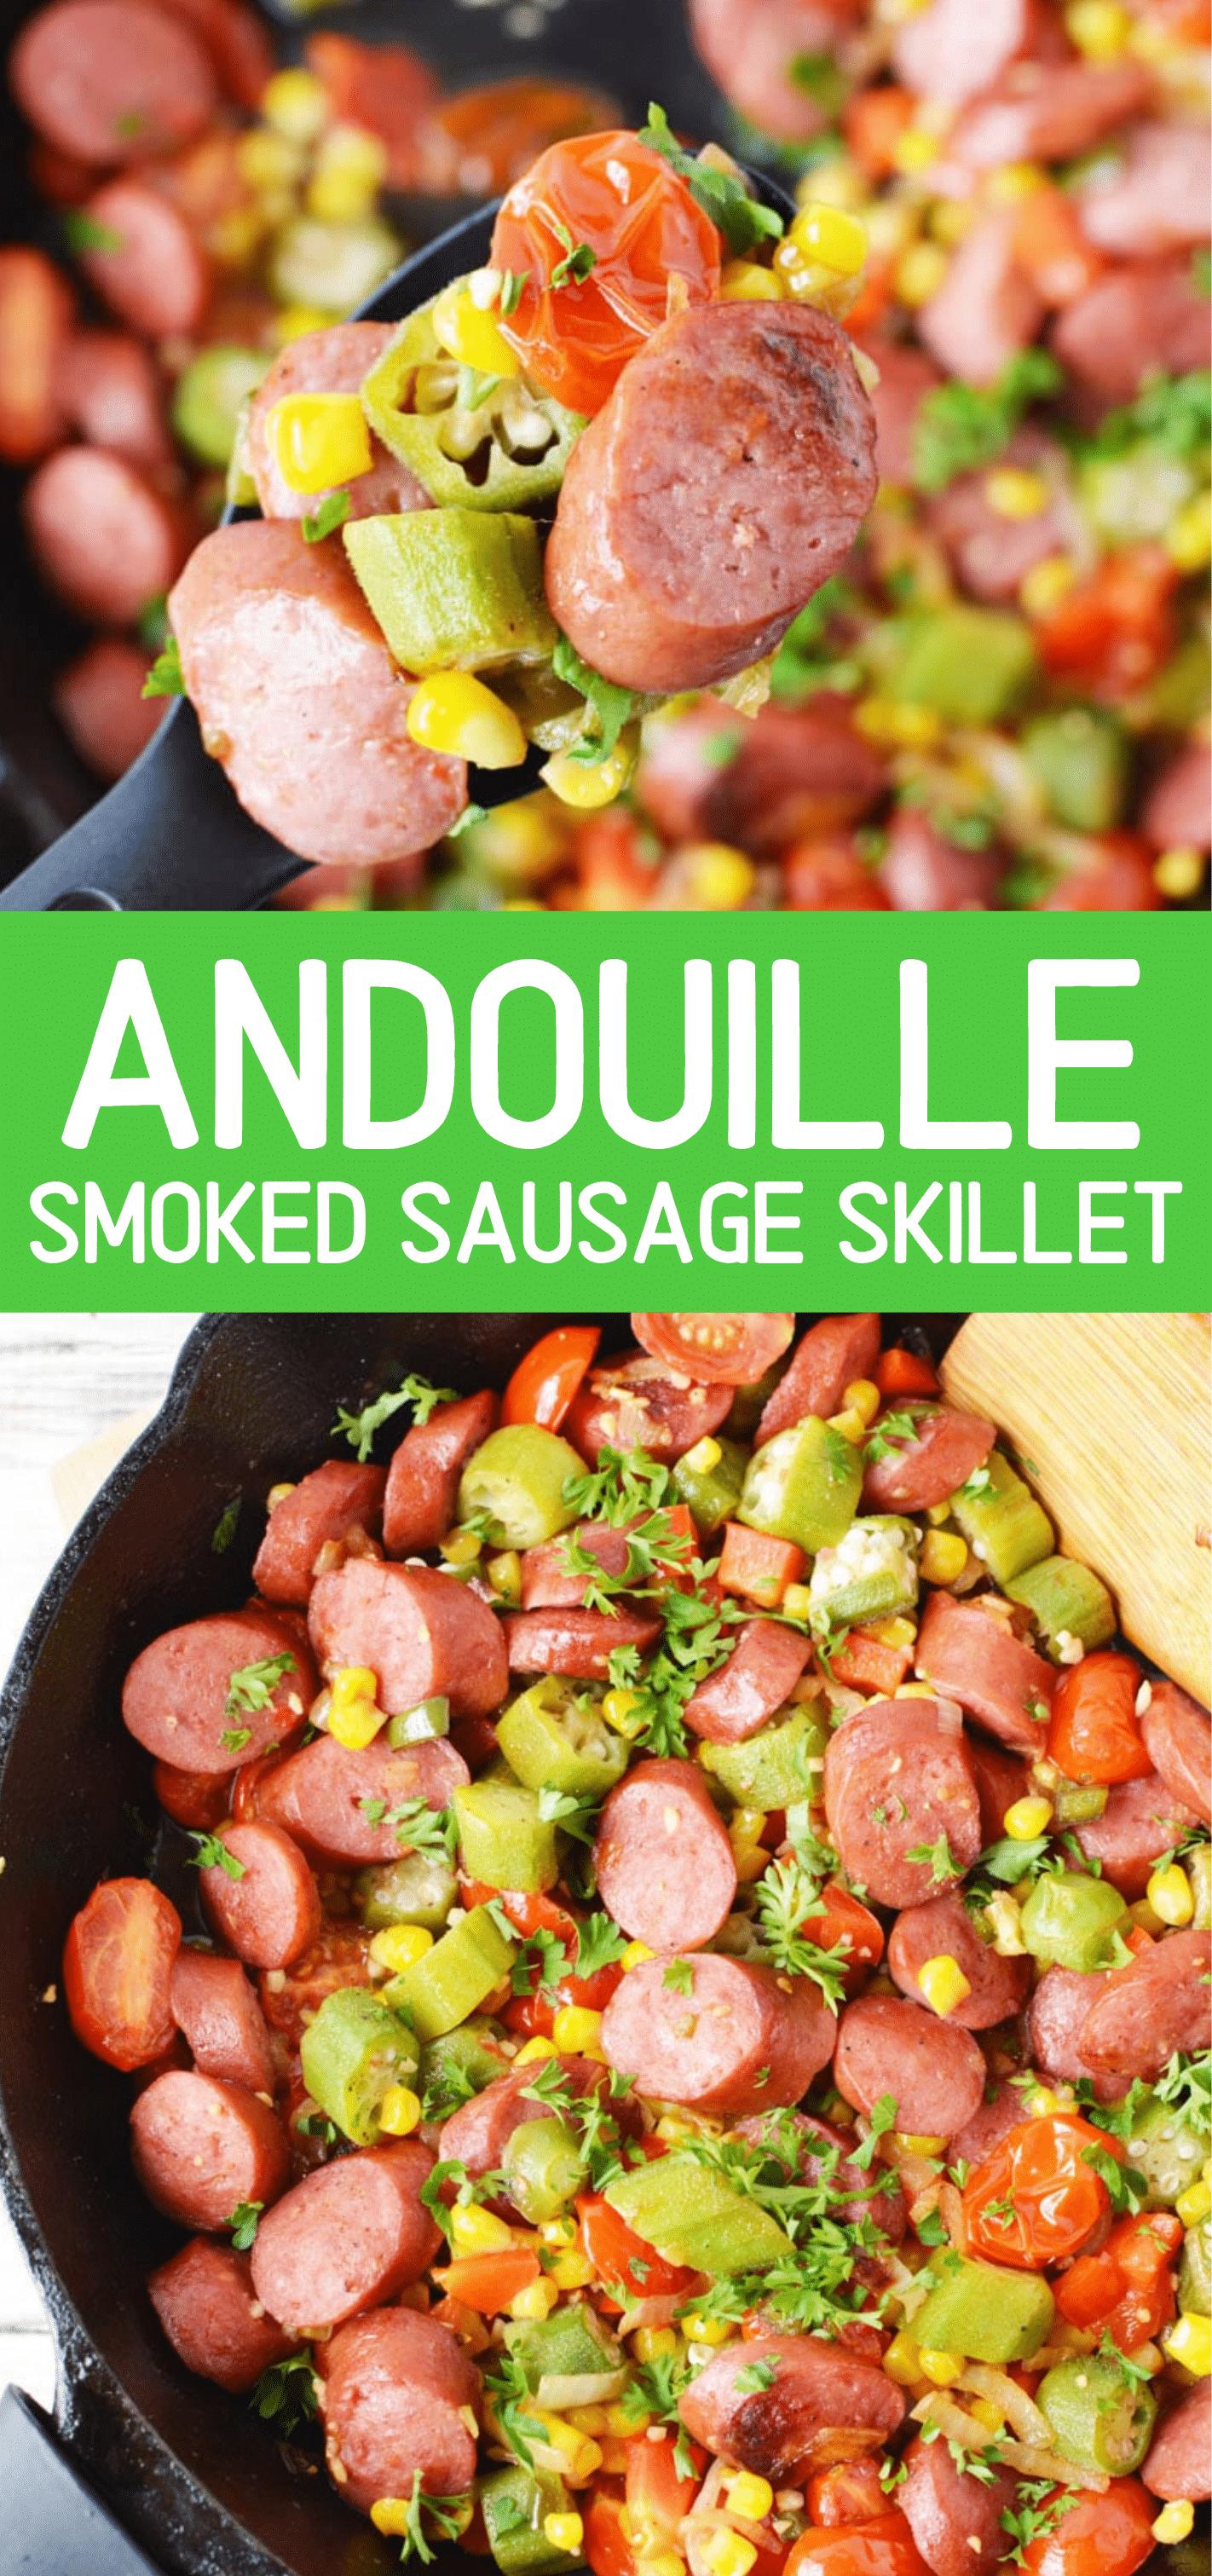 Andouille Smoked Sausage Skillet Recipe